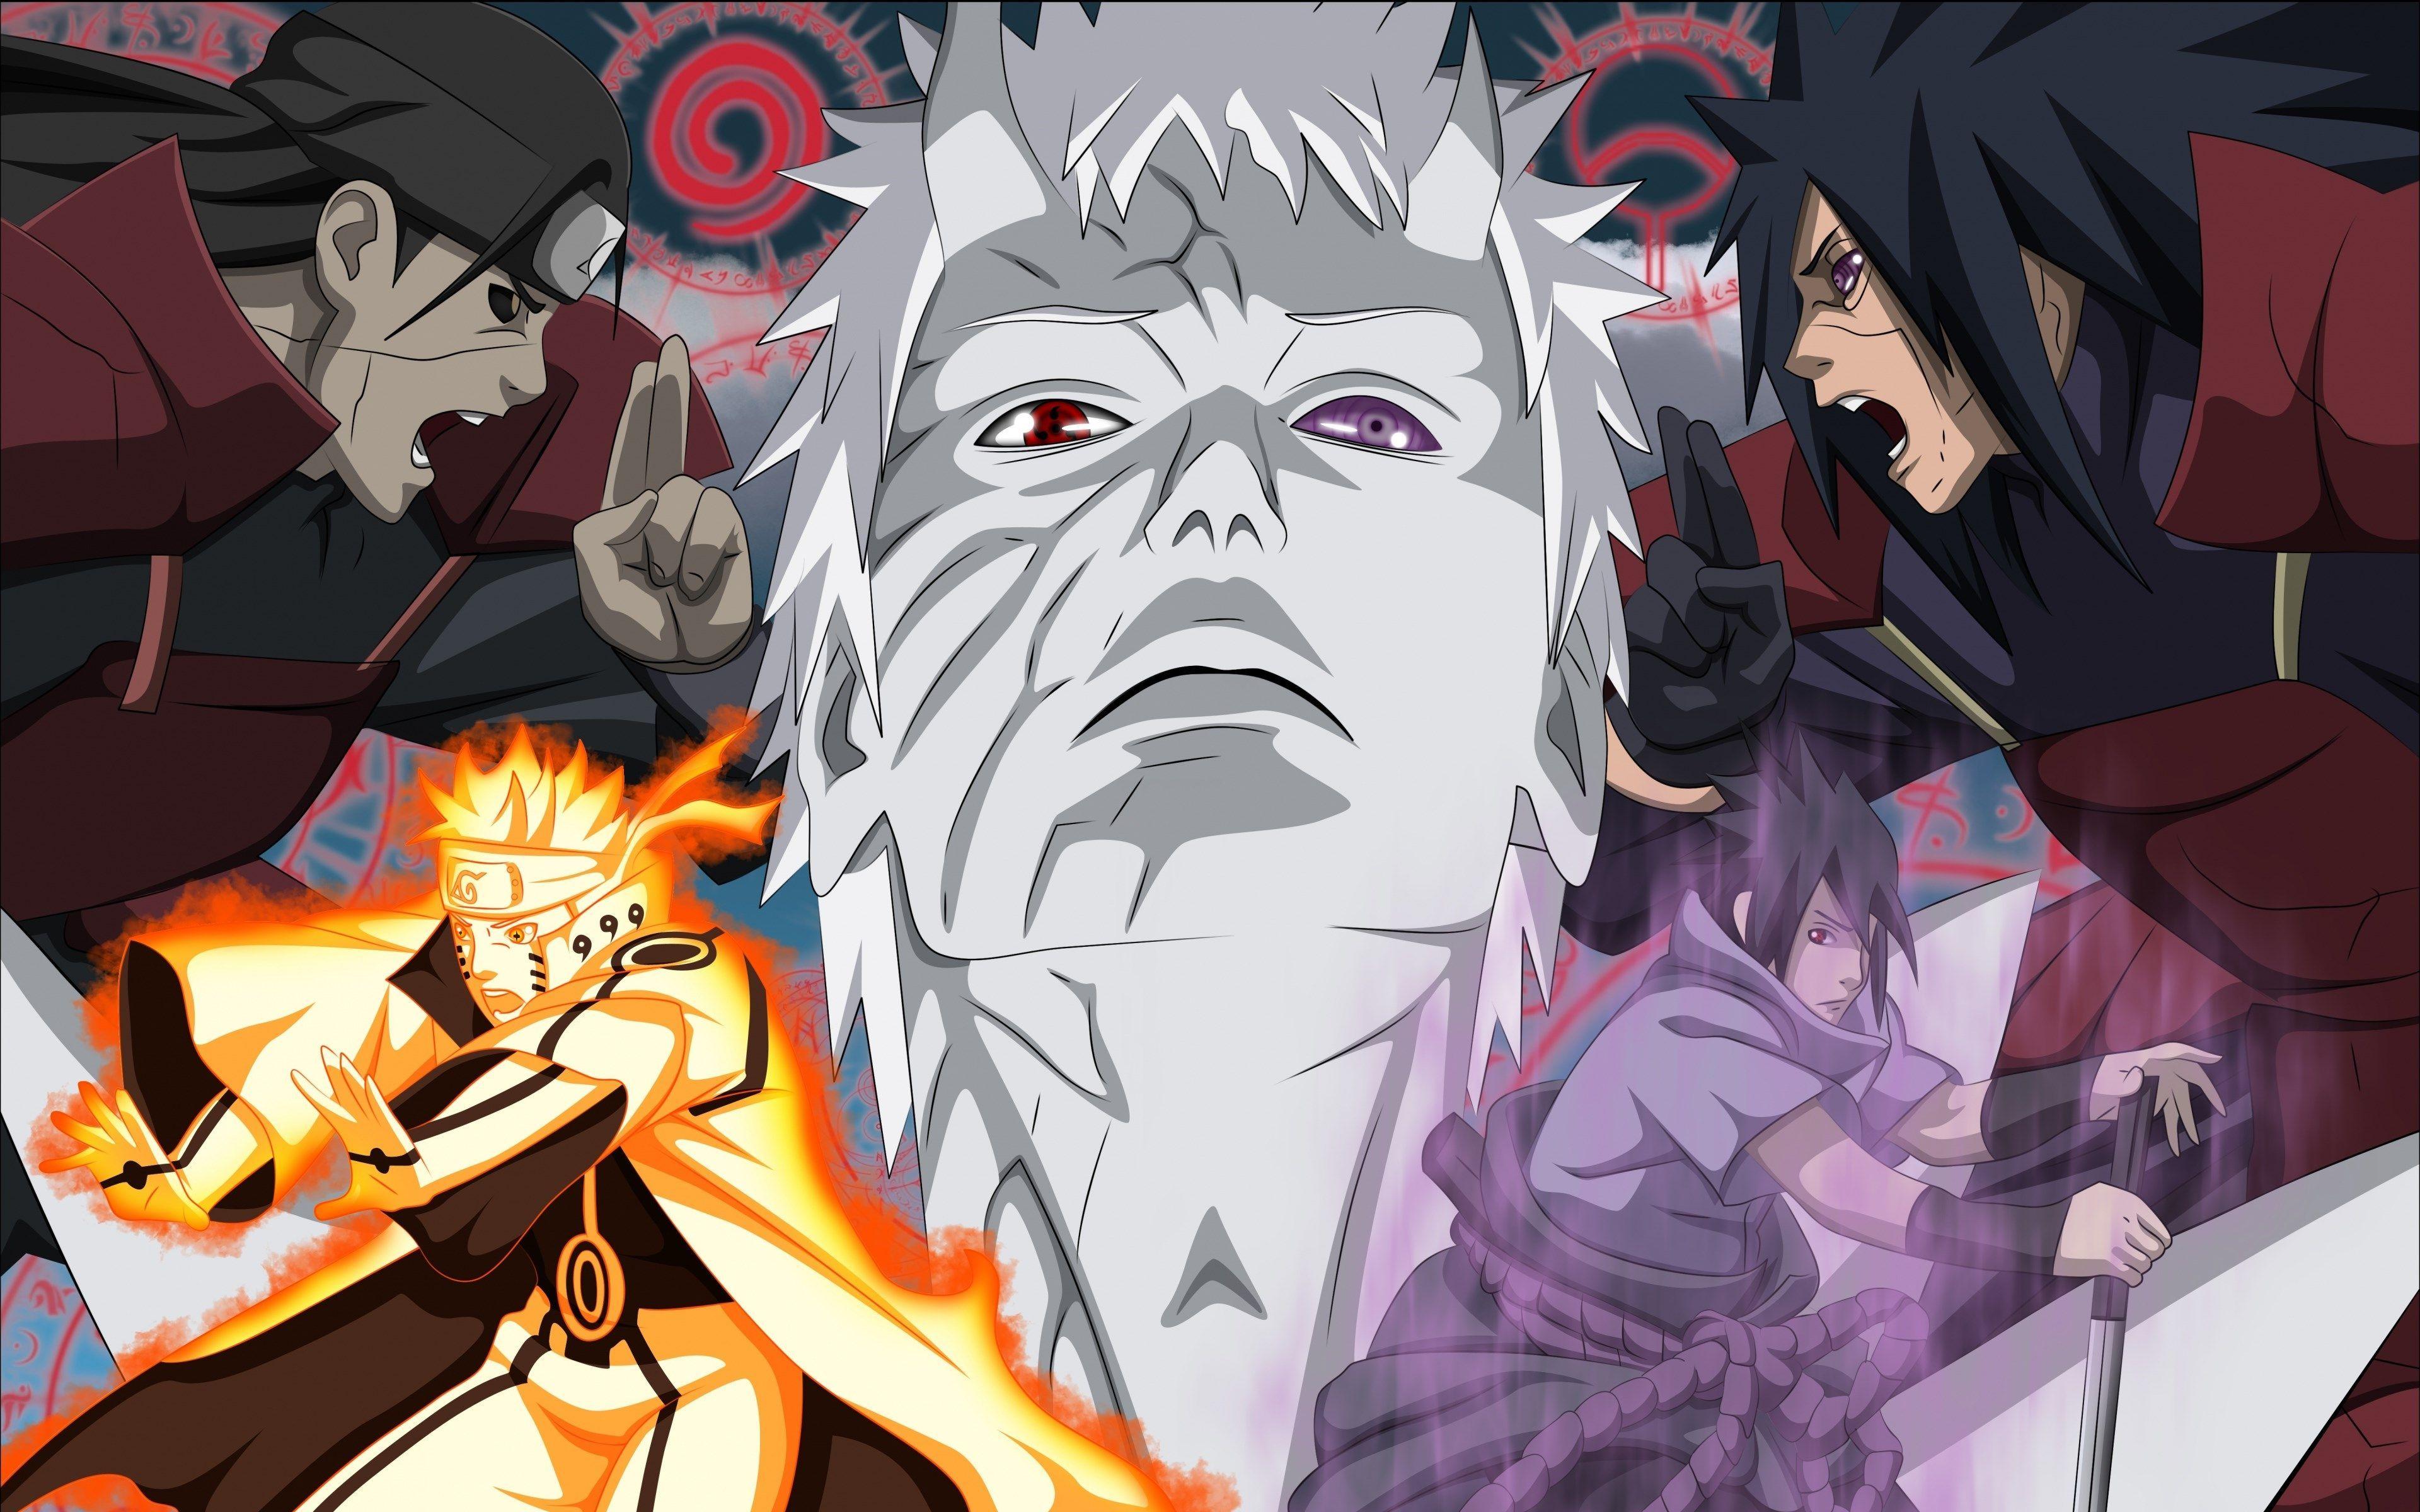 Anime 4k Naruto Shippuden Wallpapers Wallpaper Cave